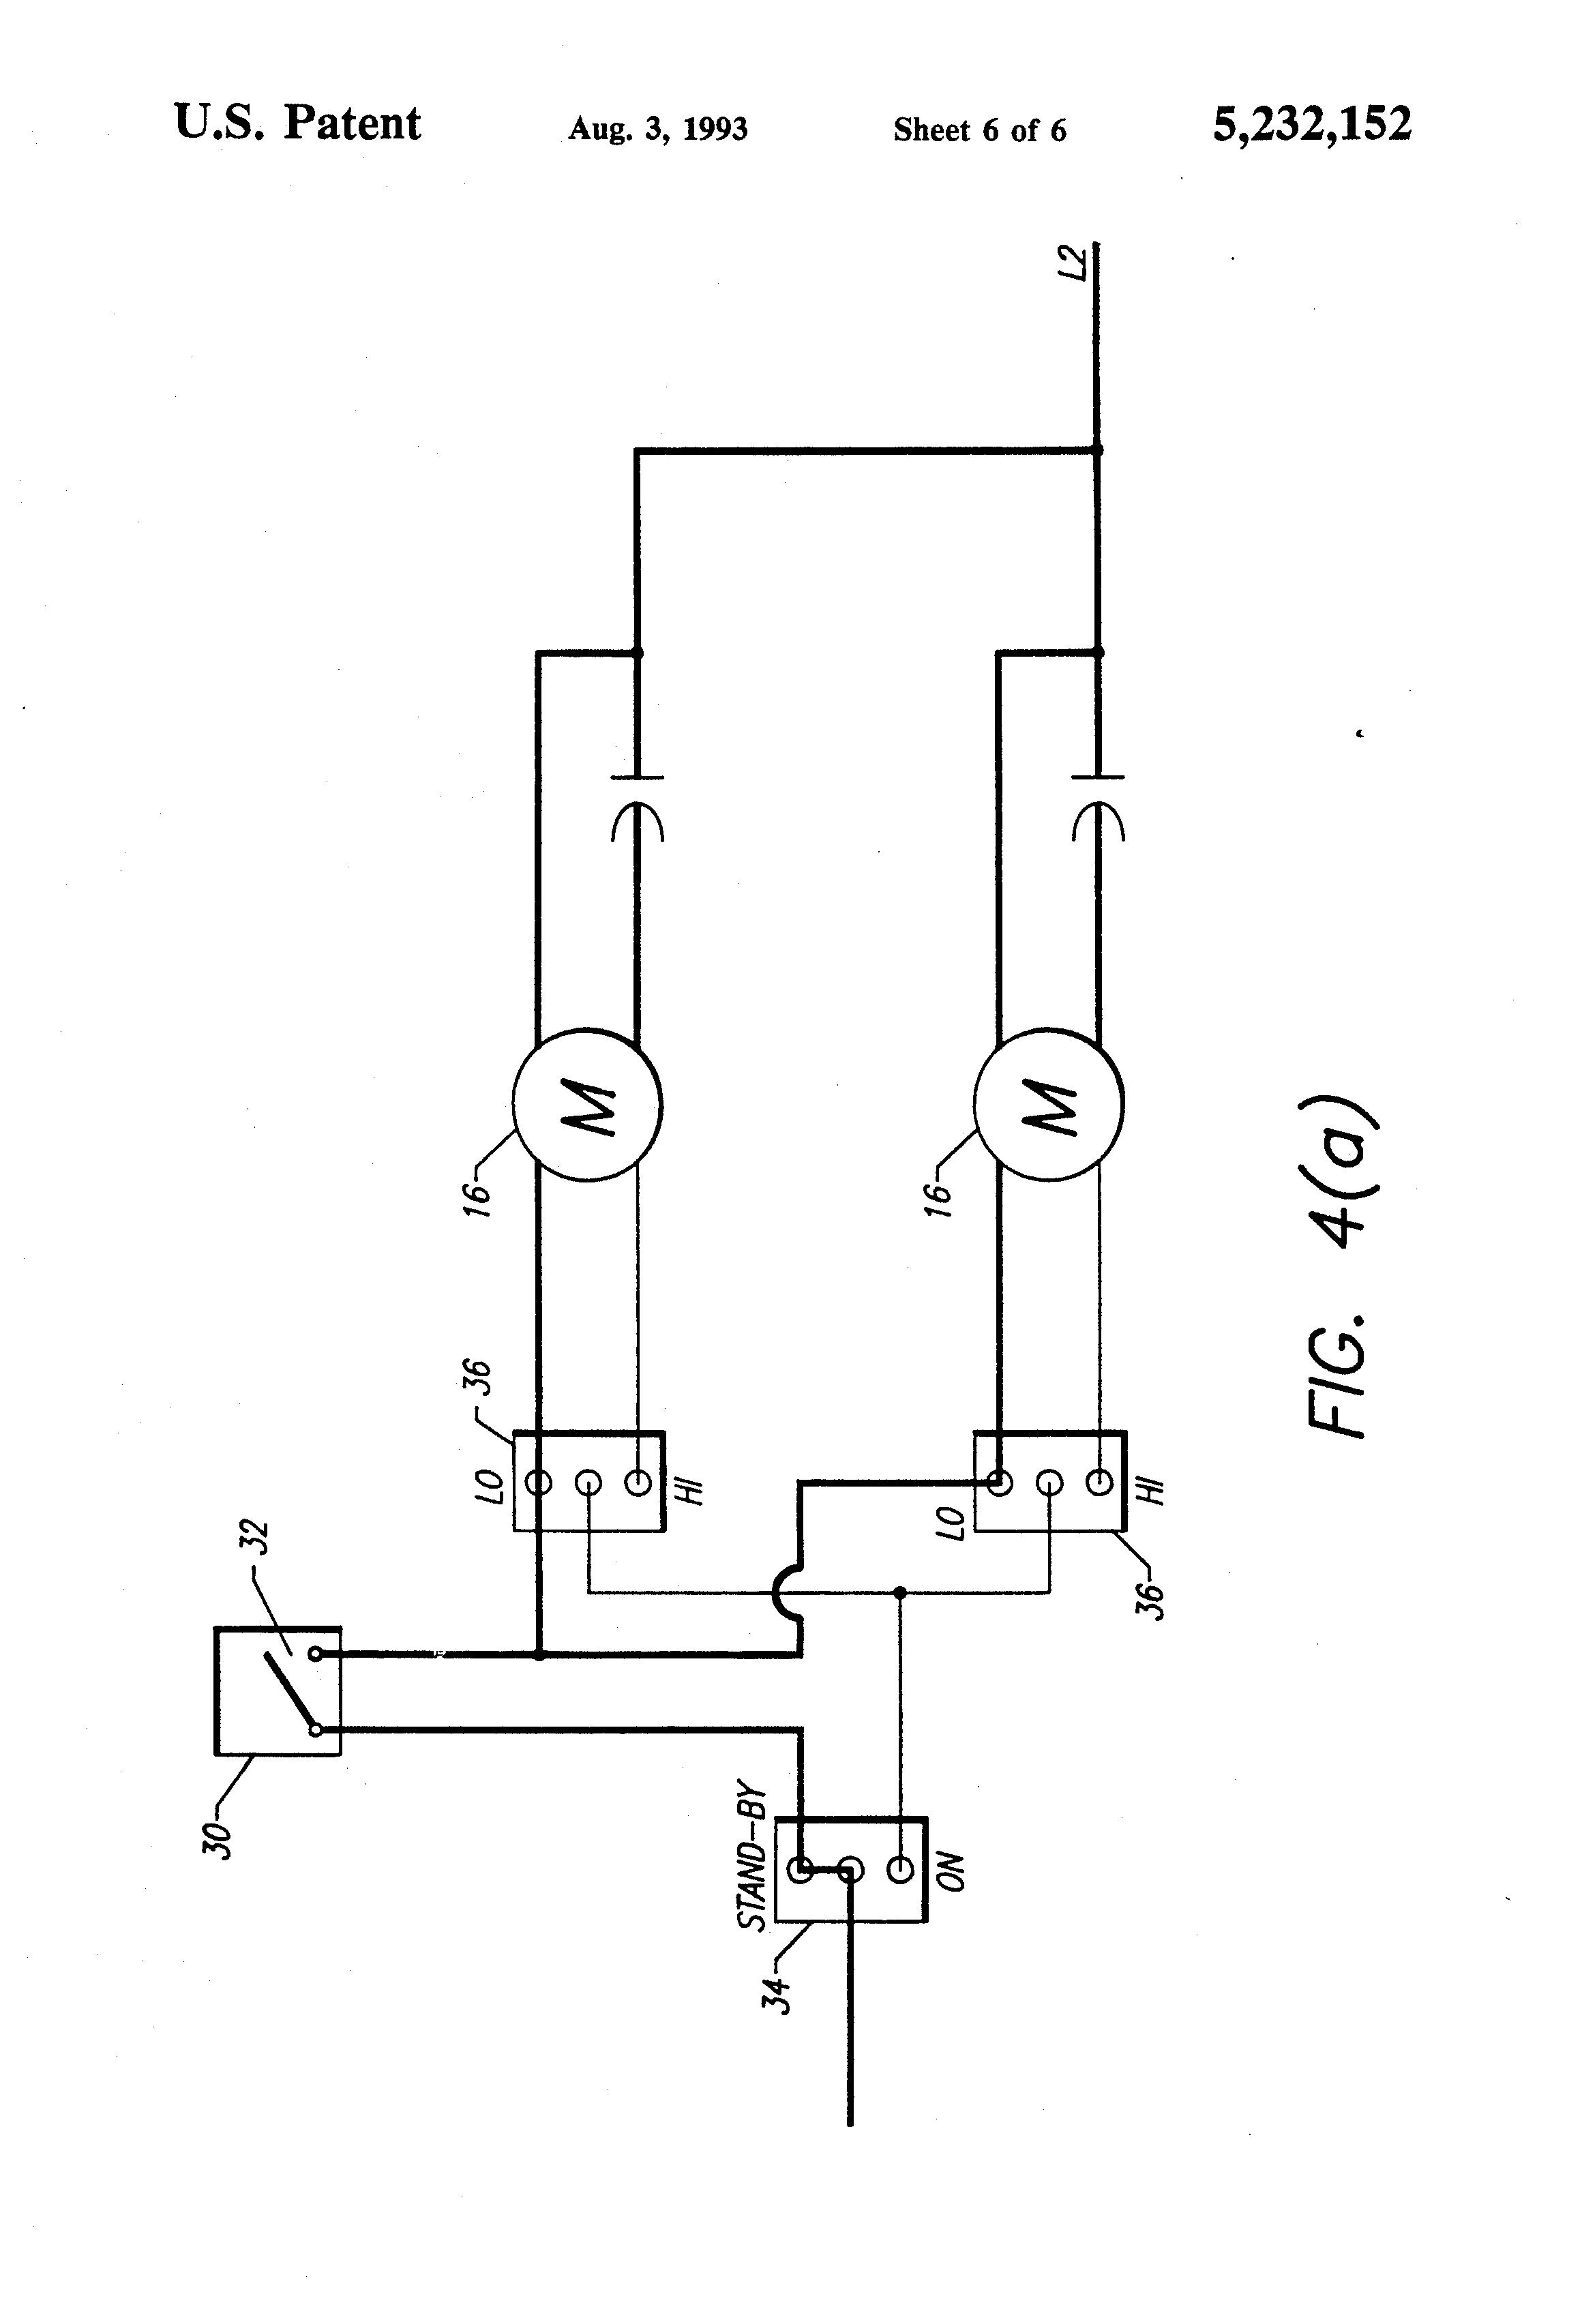 Aprilaire Model 60 Humidistat Wiring Diagram